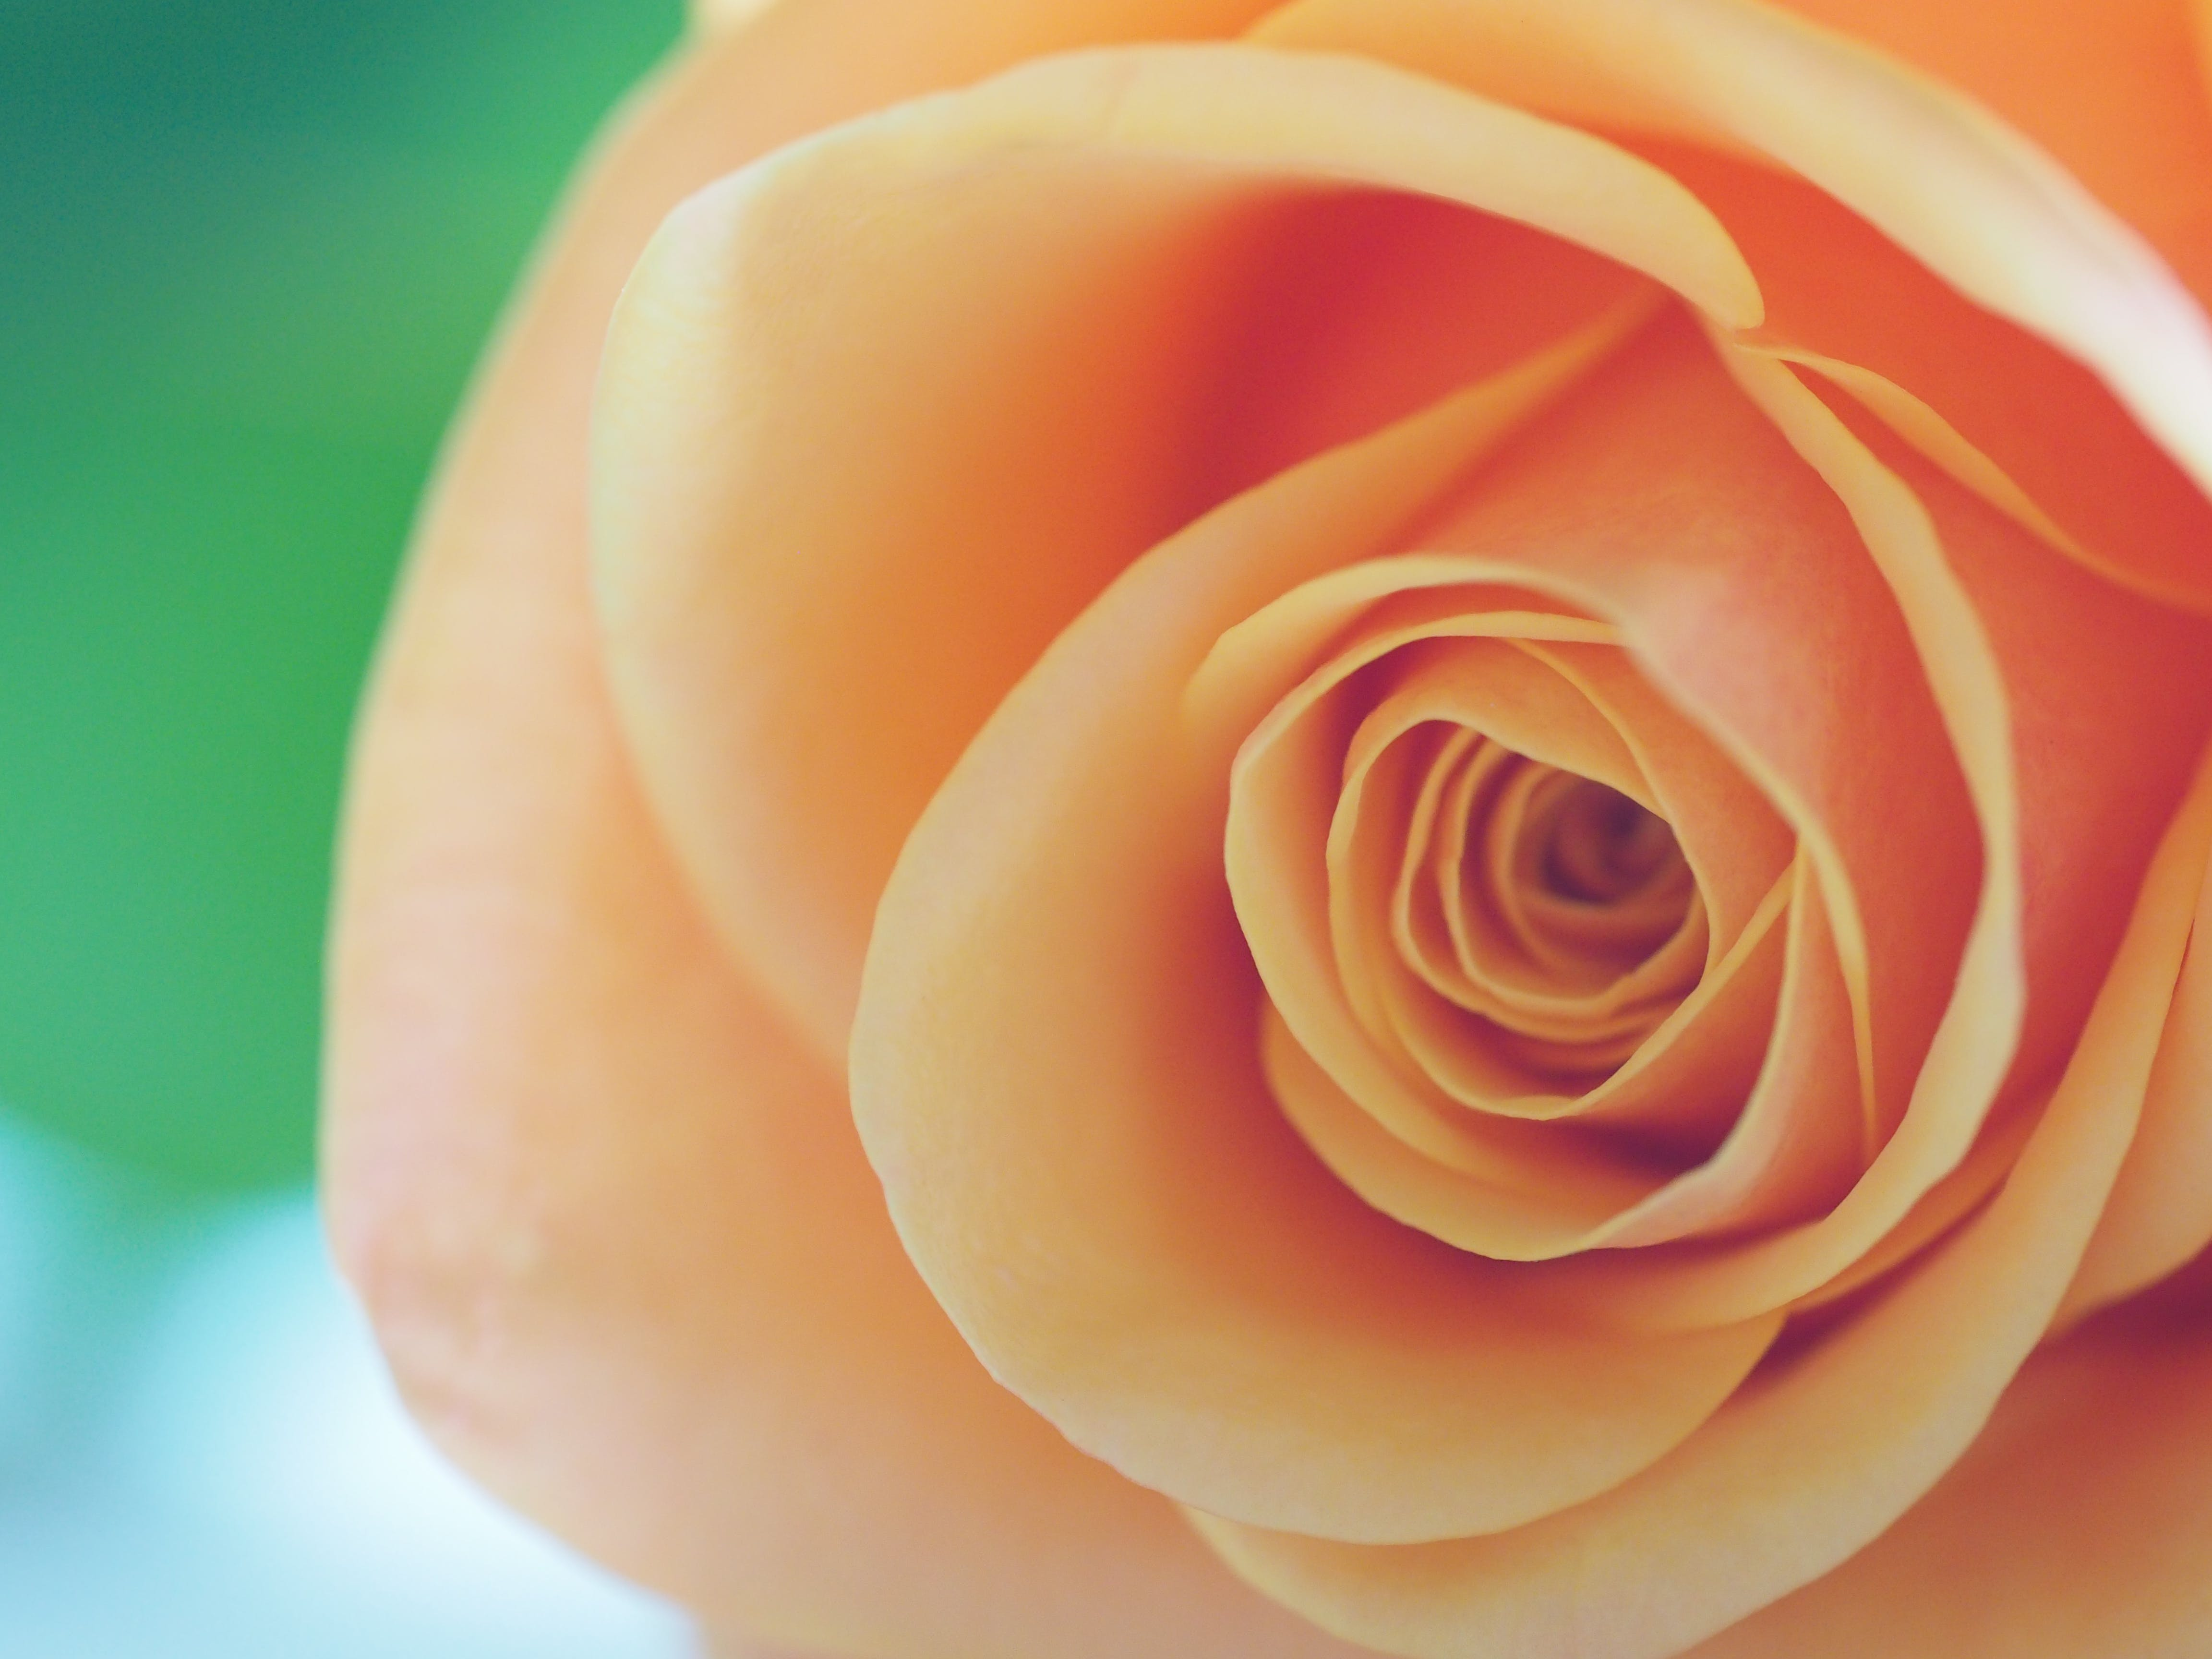 Free stock photo of nature, love, blur, orange